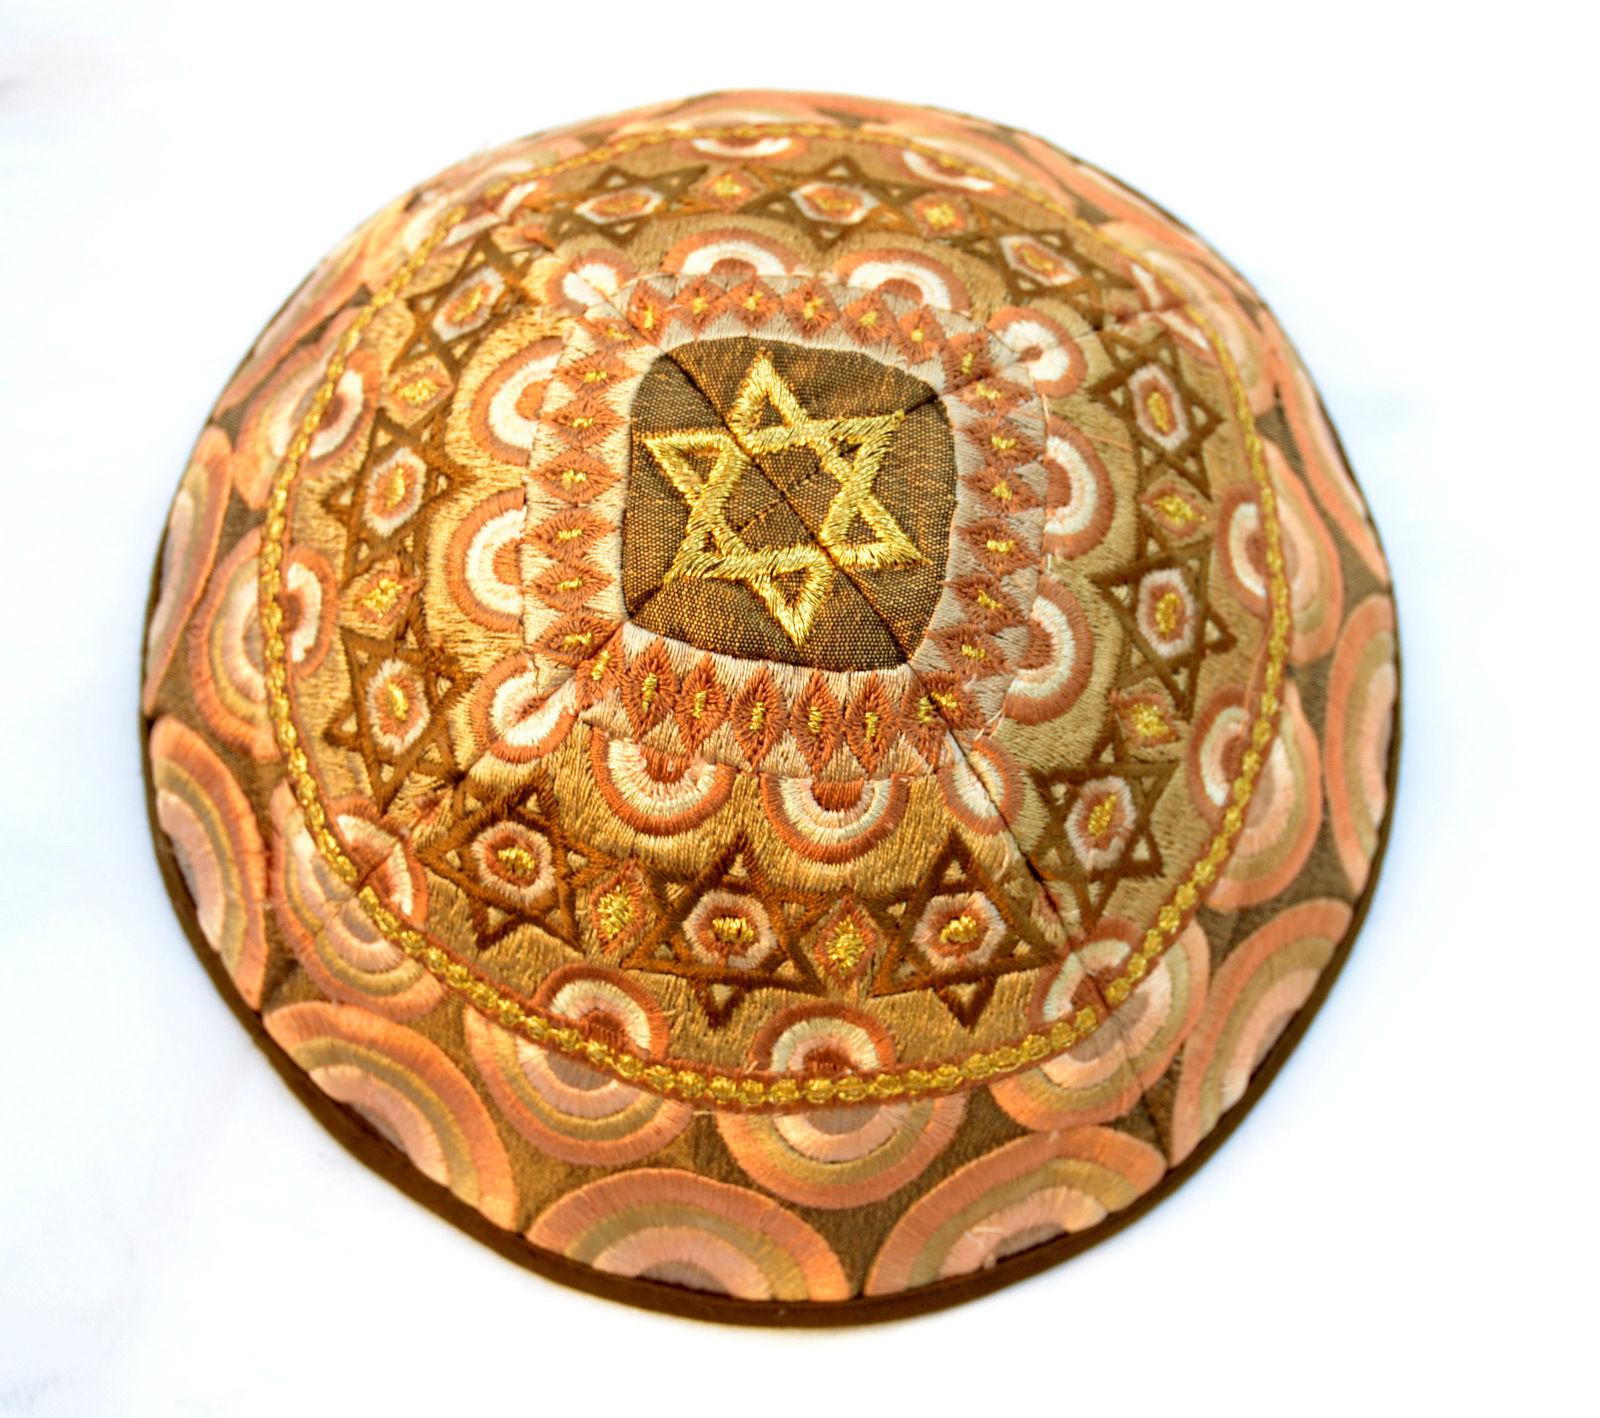 KIPPAH Yarmulke-Embroidered Kippas Star of David Rainbow Emanuel gold S-8